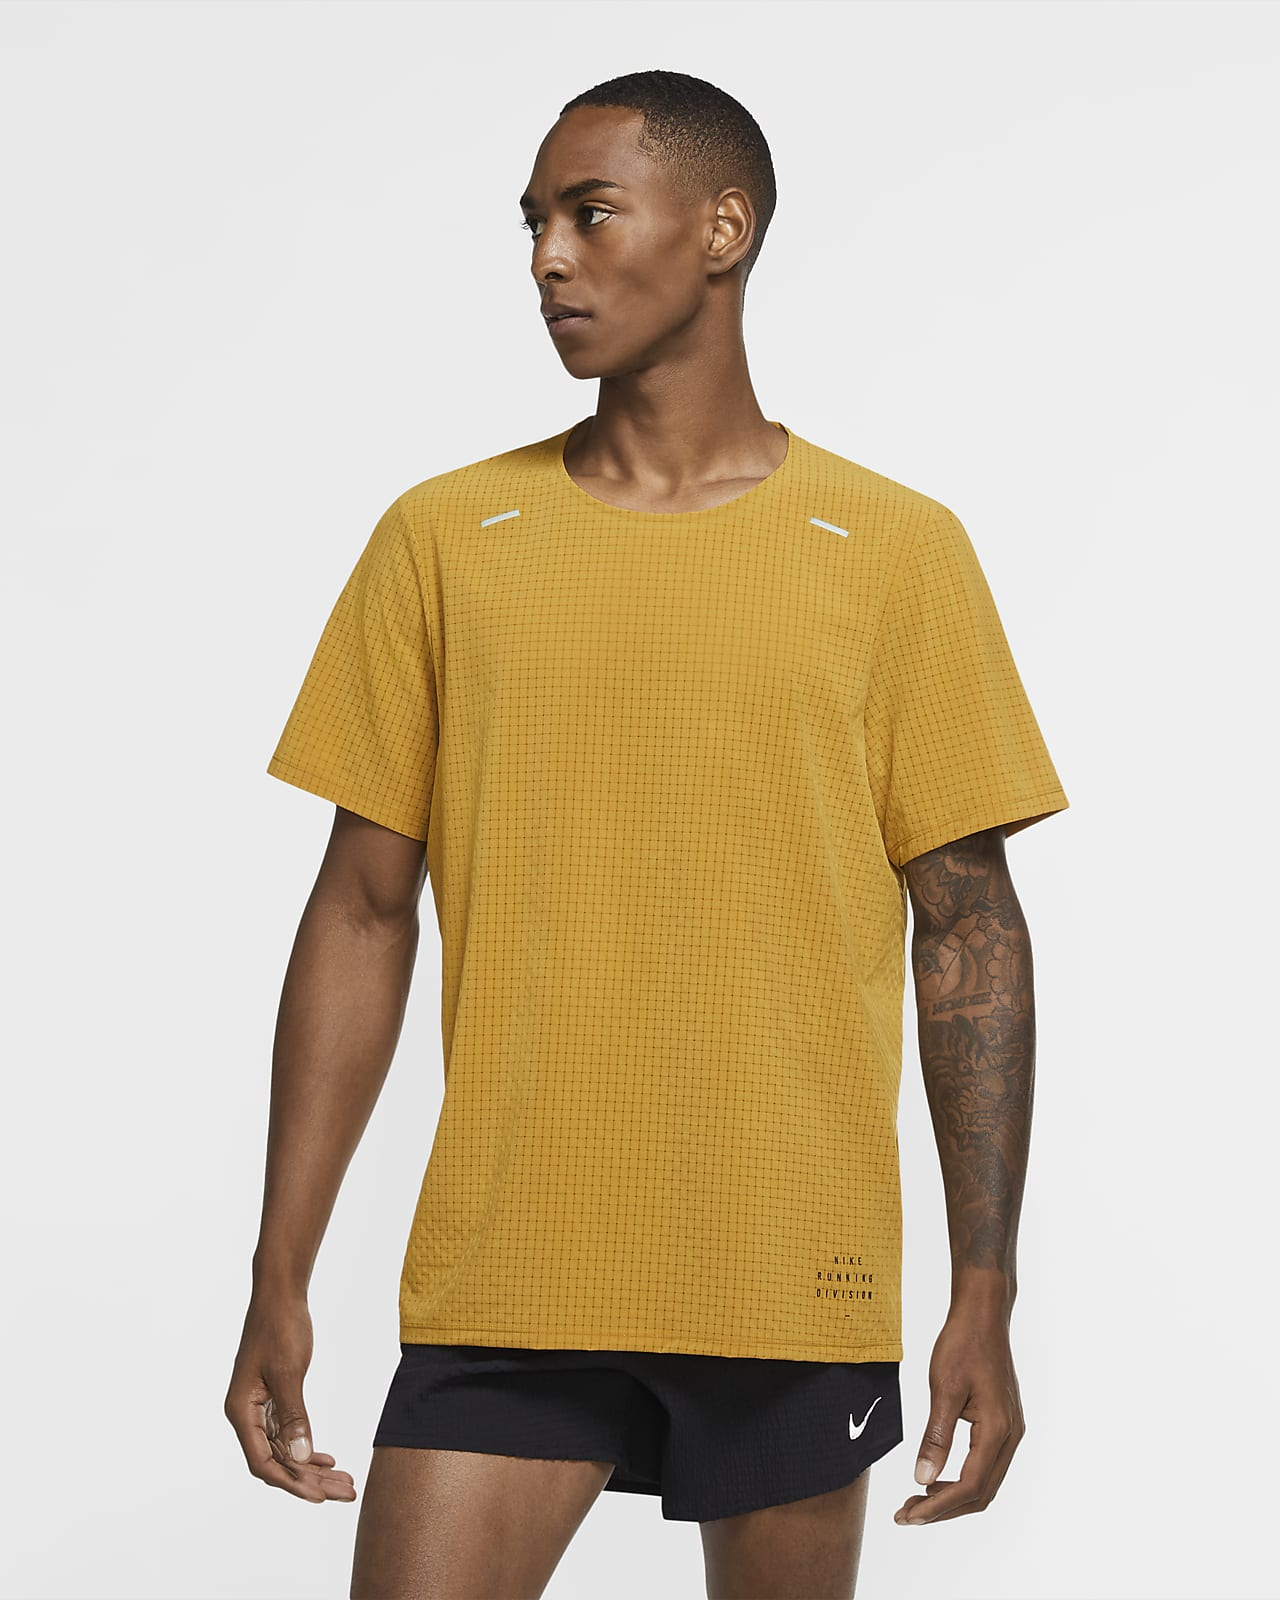 Nike Run Division Adapt Men's Short-Sleeve Running Top